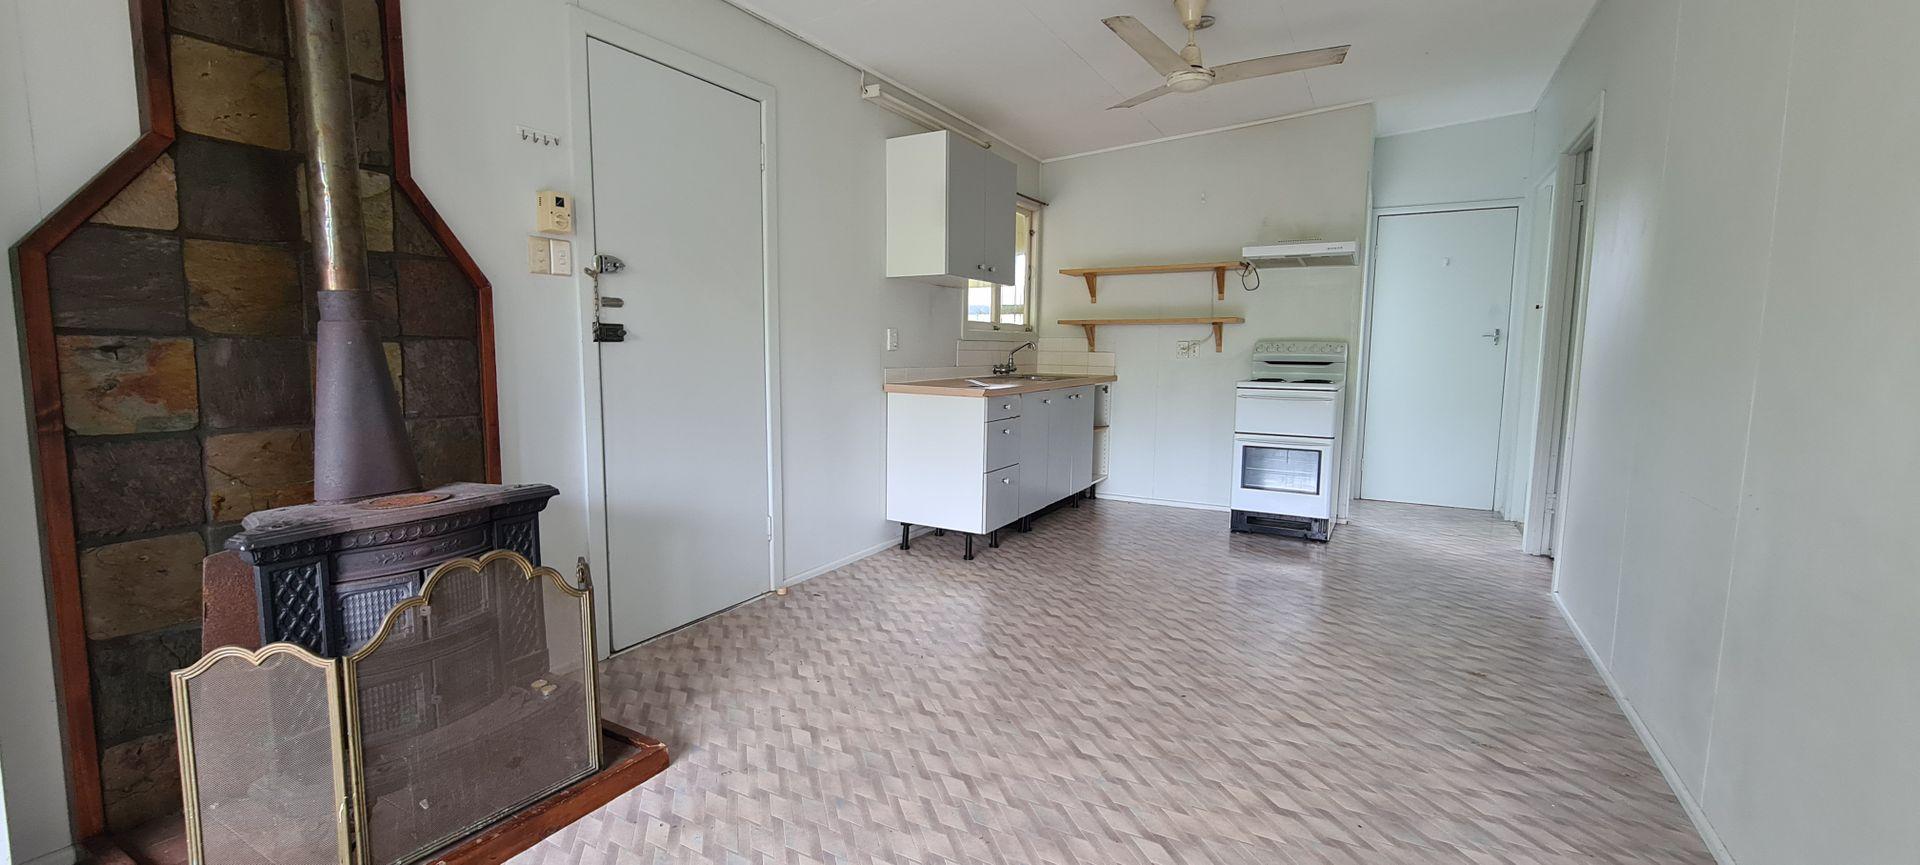 27 Row Street, Kilcoy QLD 4515, Image 1